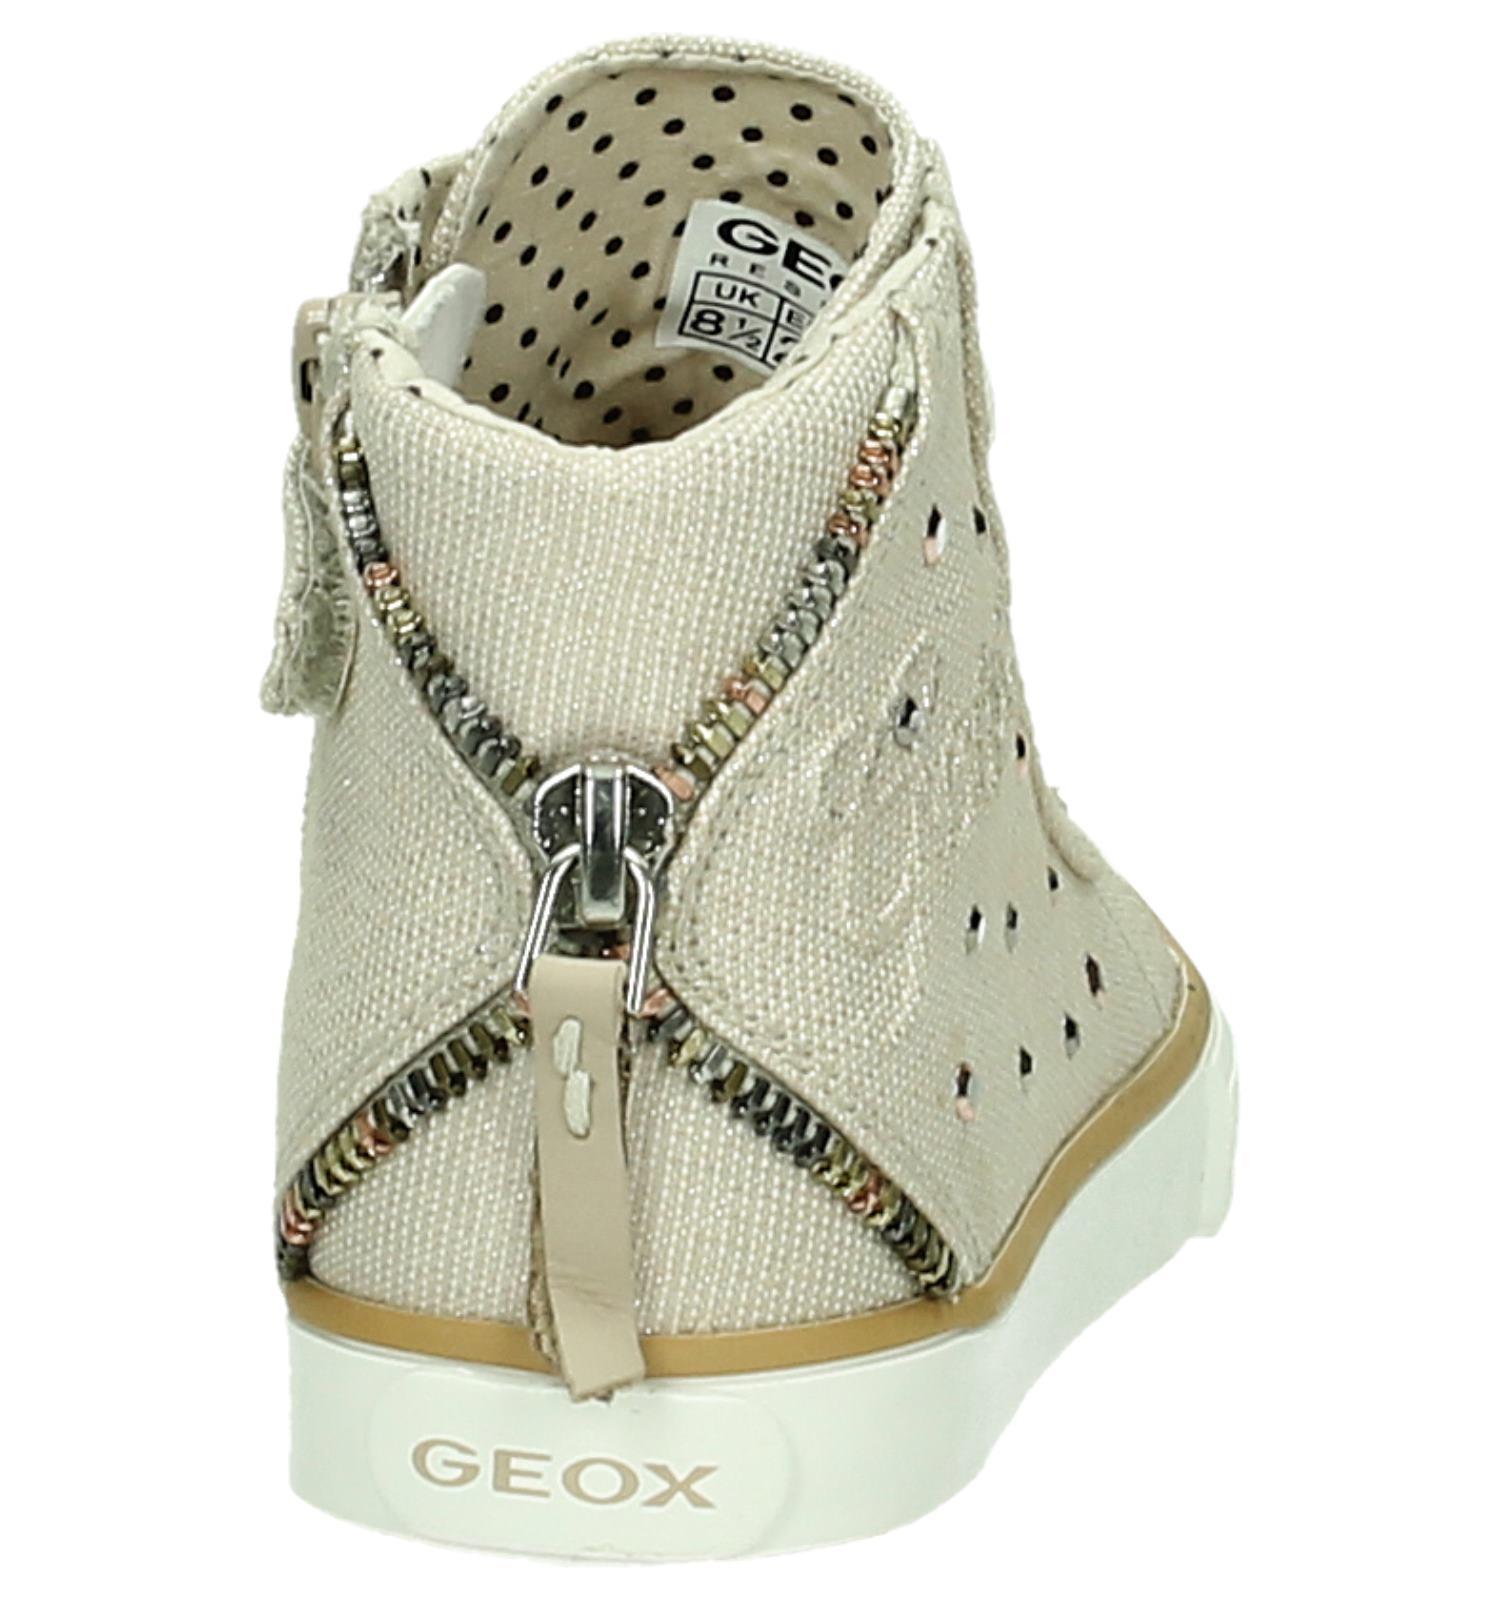 be En Geox Retour Verzend Hoge Torfs Sneaker Gratis Beige qWfxvHwgx